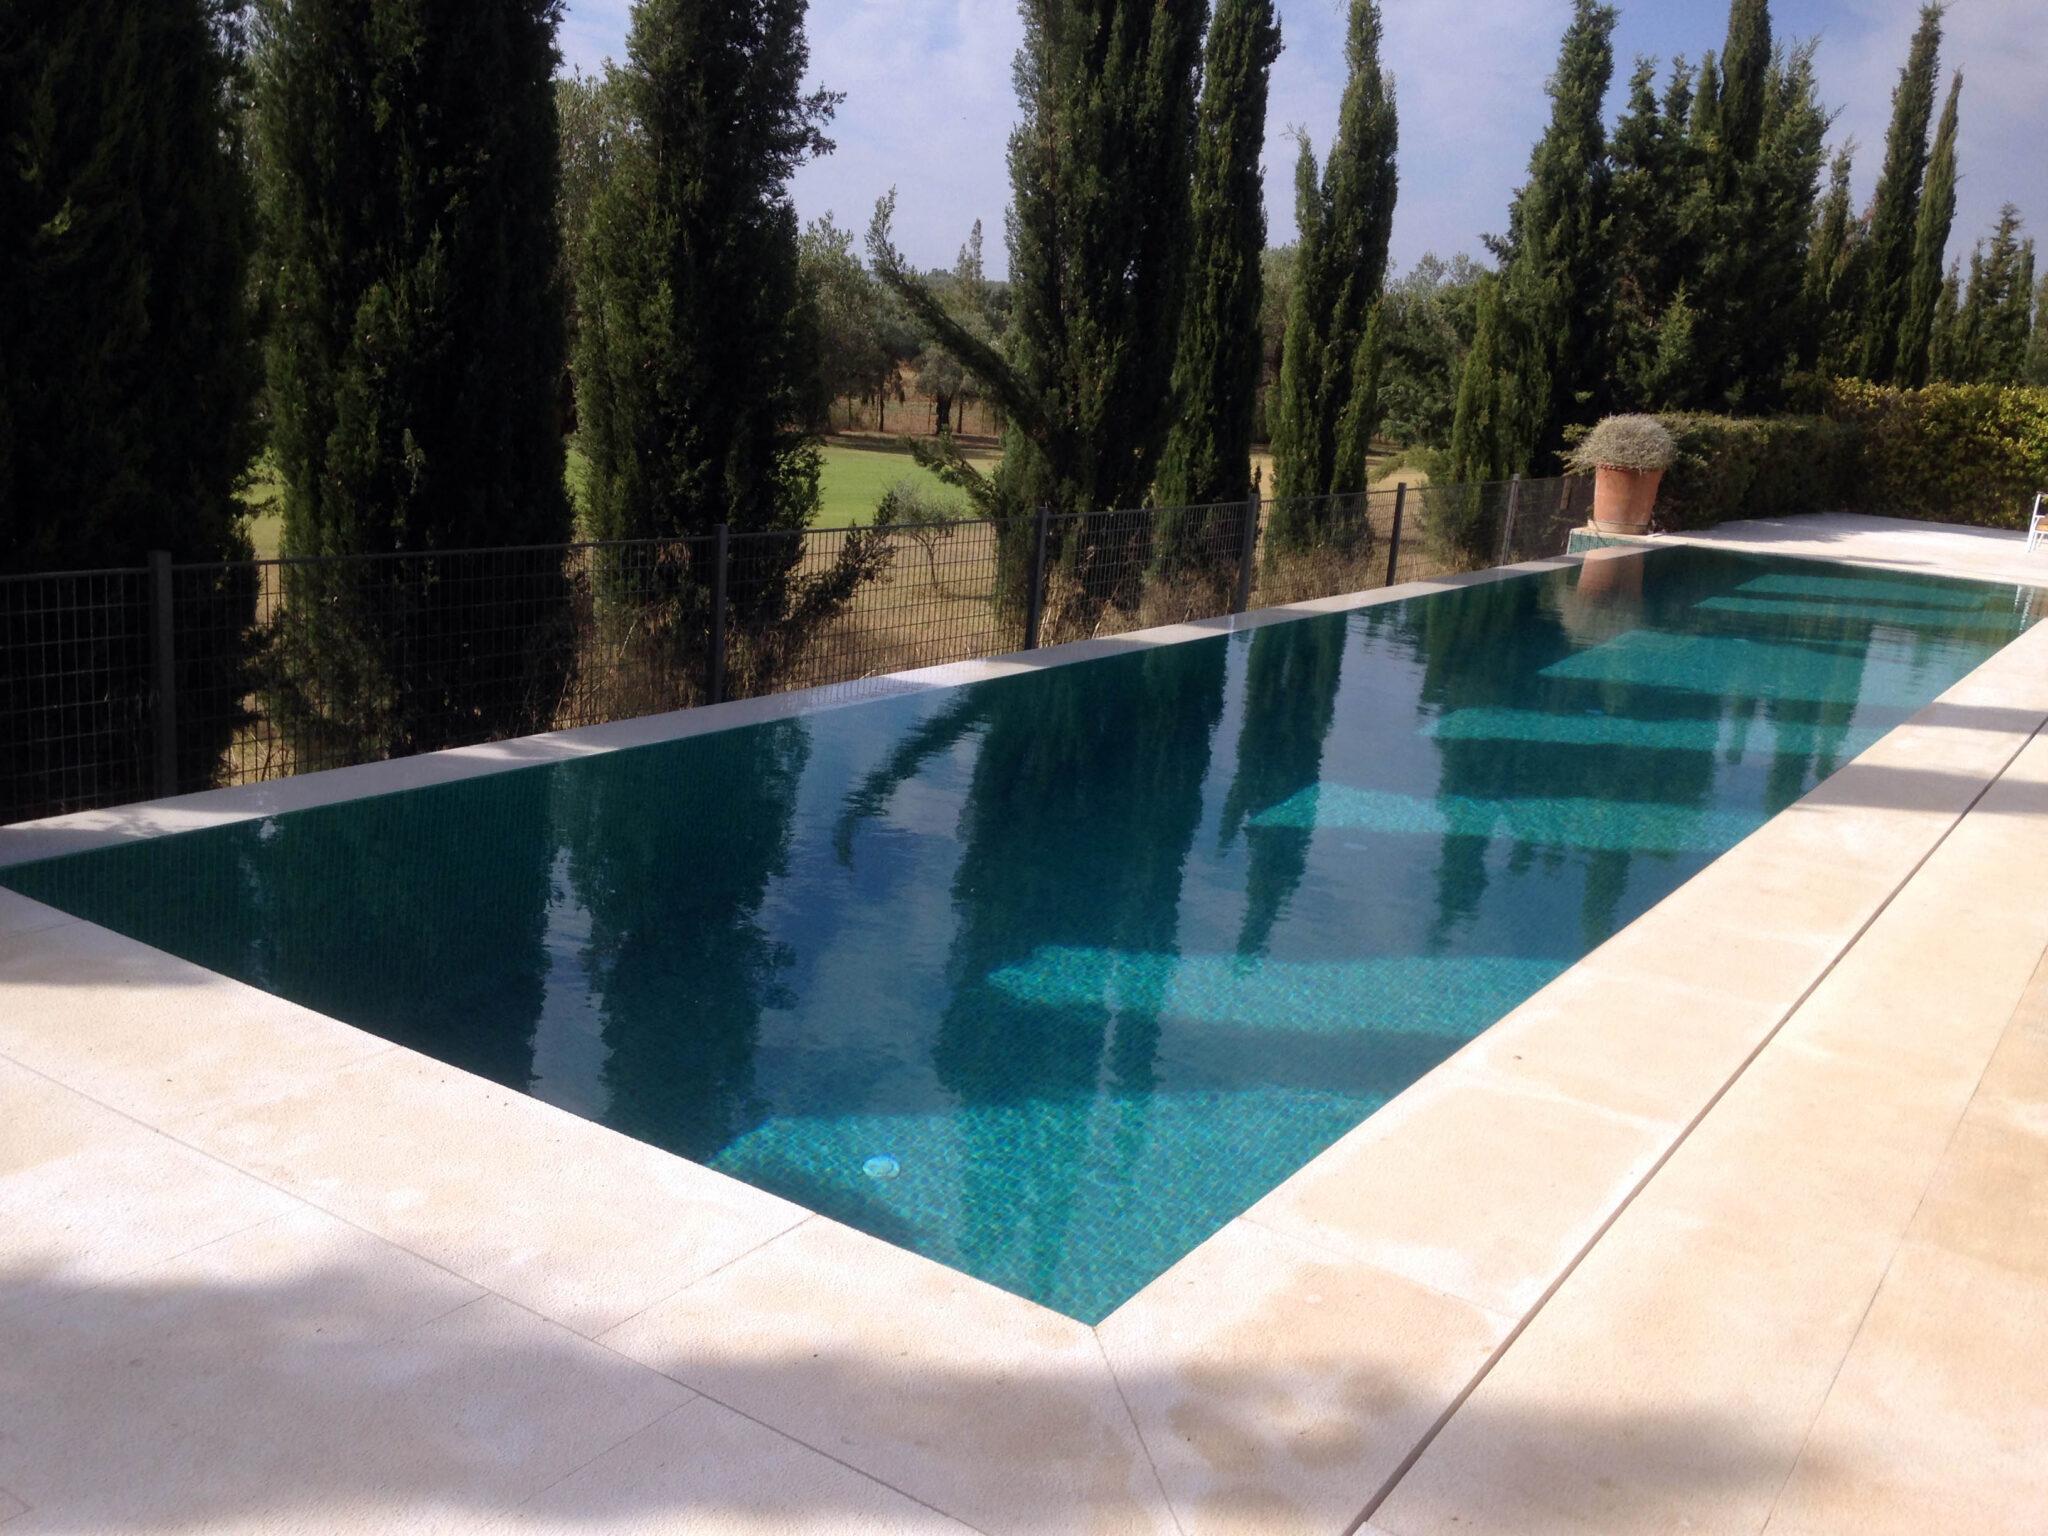 Proyecto-hisbalit-Adriático-Eloy-Adriatico-9-scaled